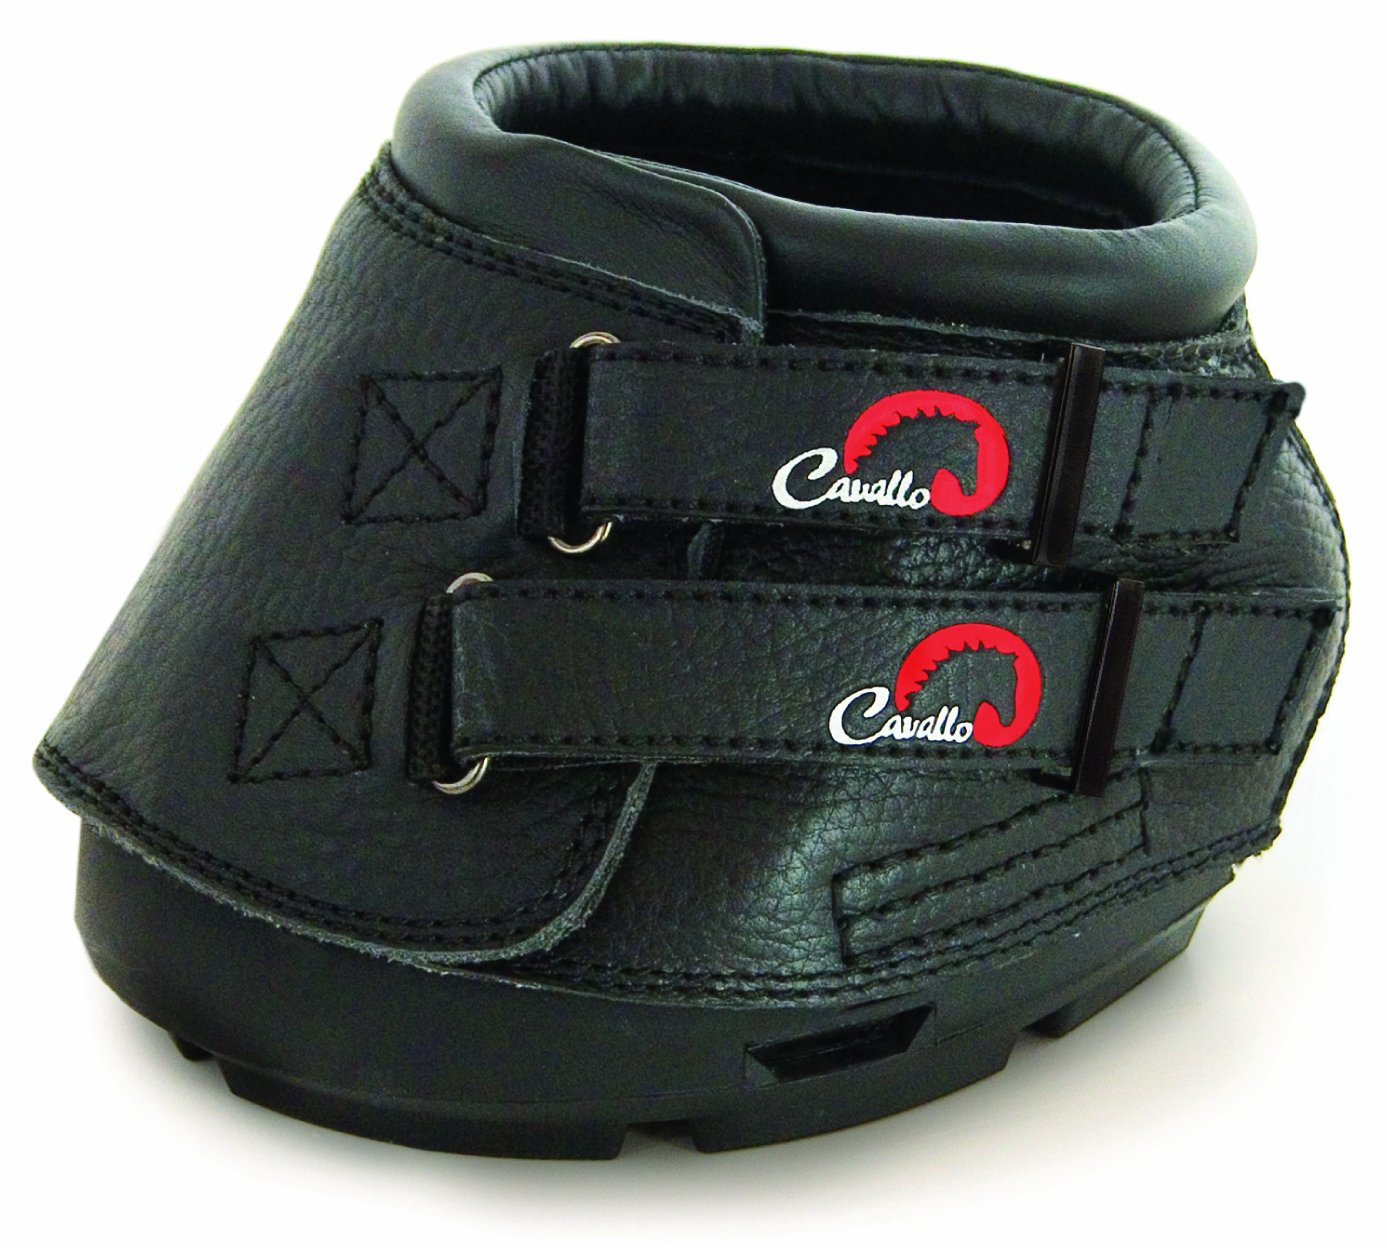 #1 - Cavallo Simple Horse Boot